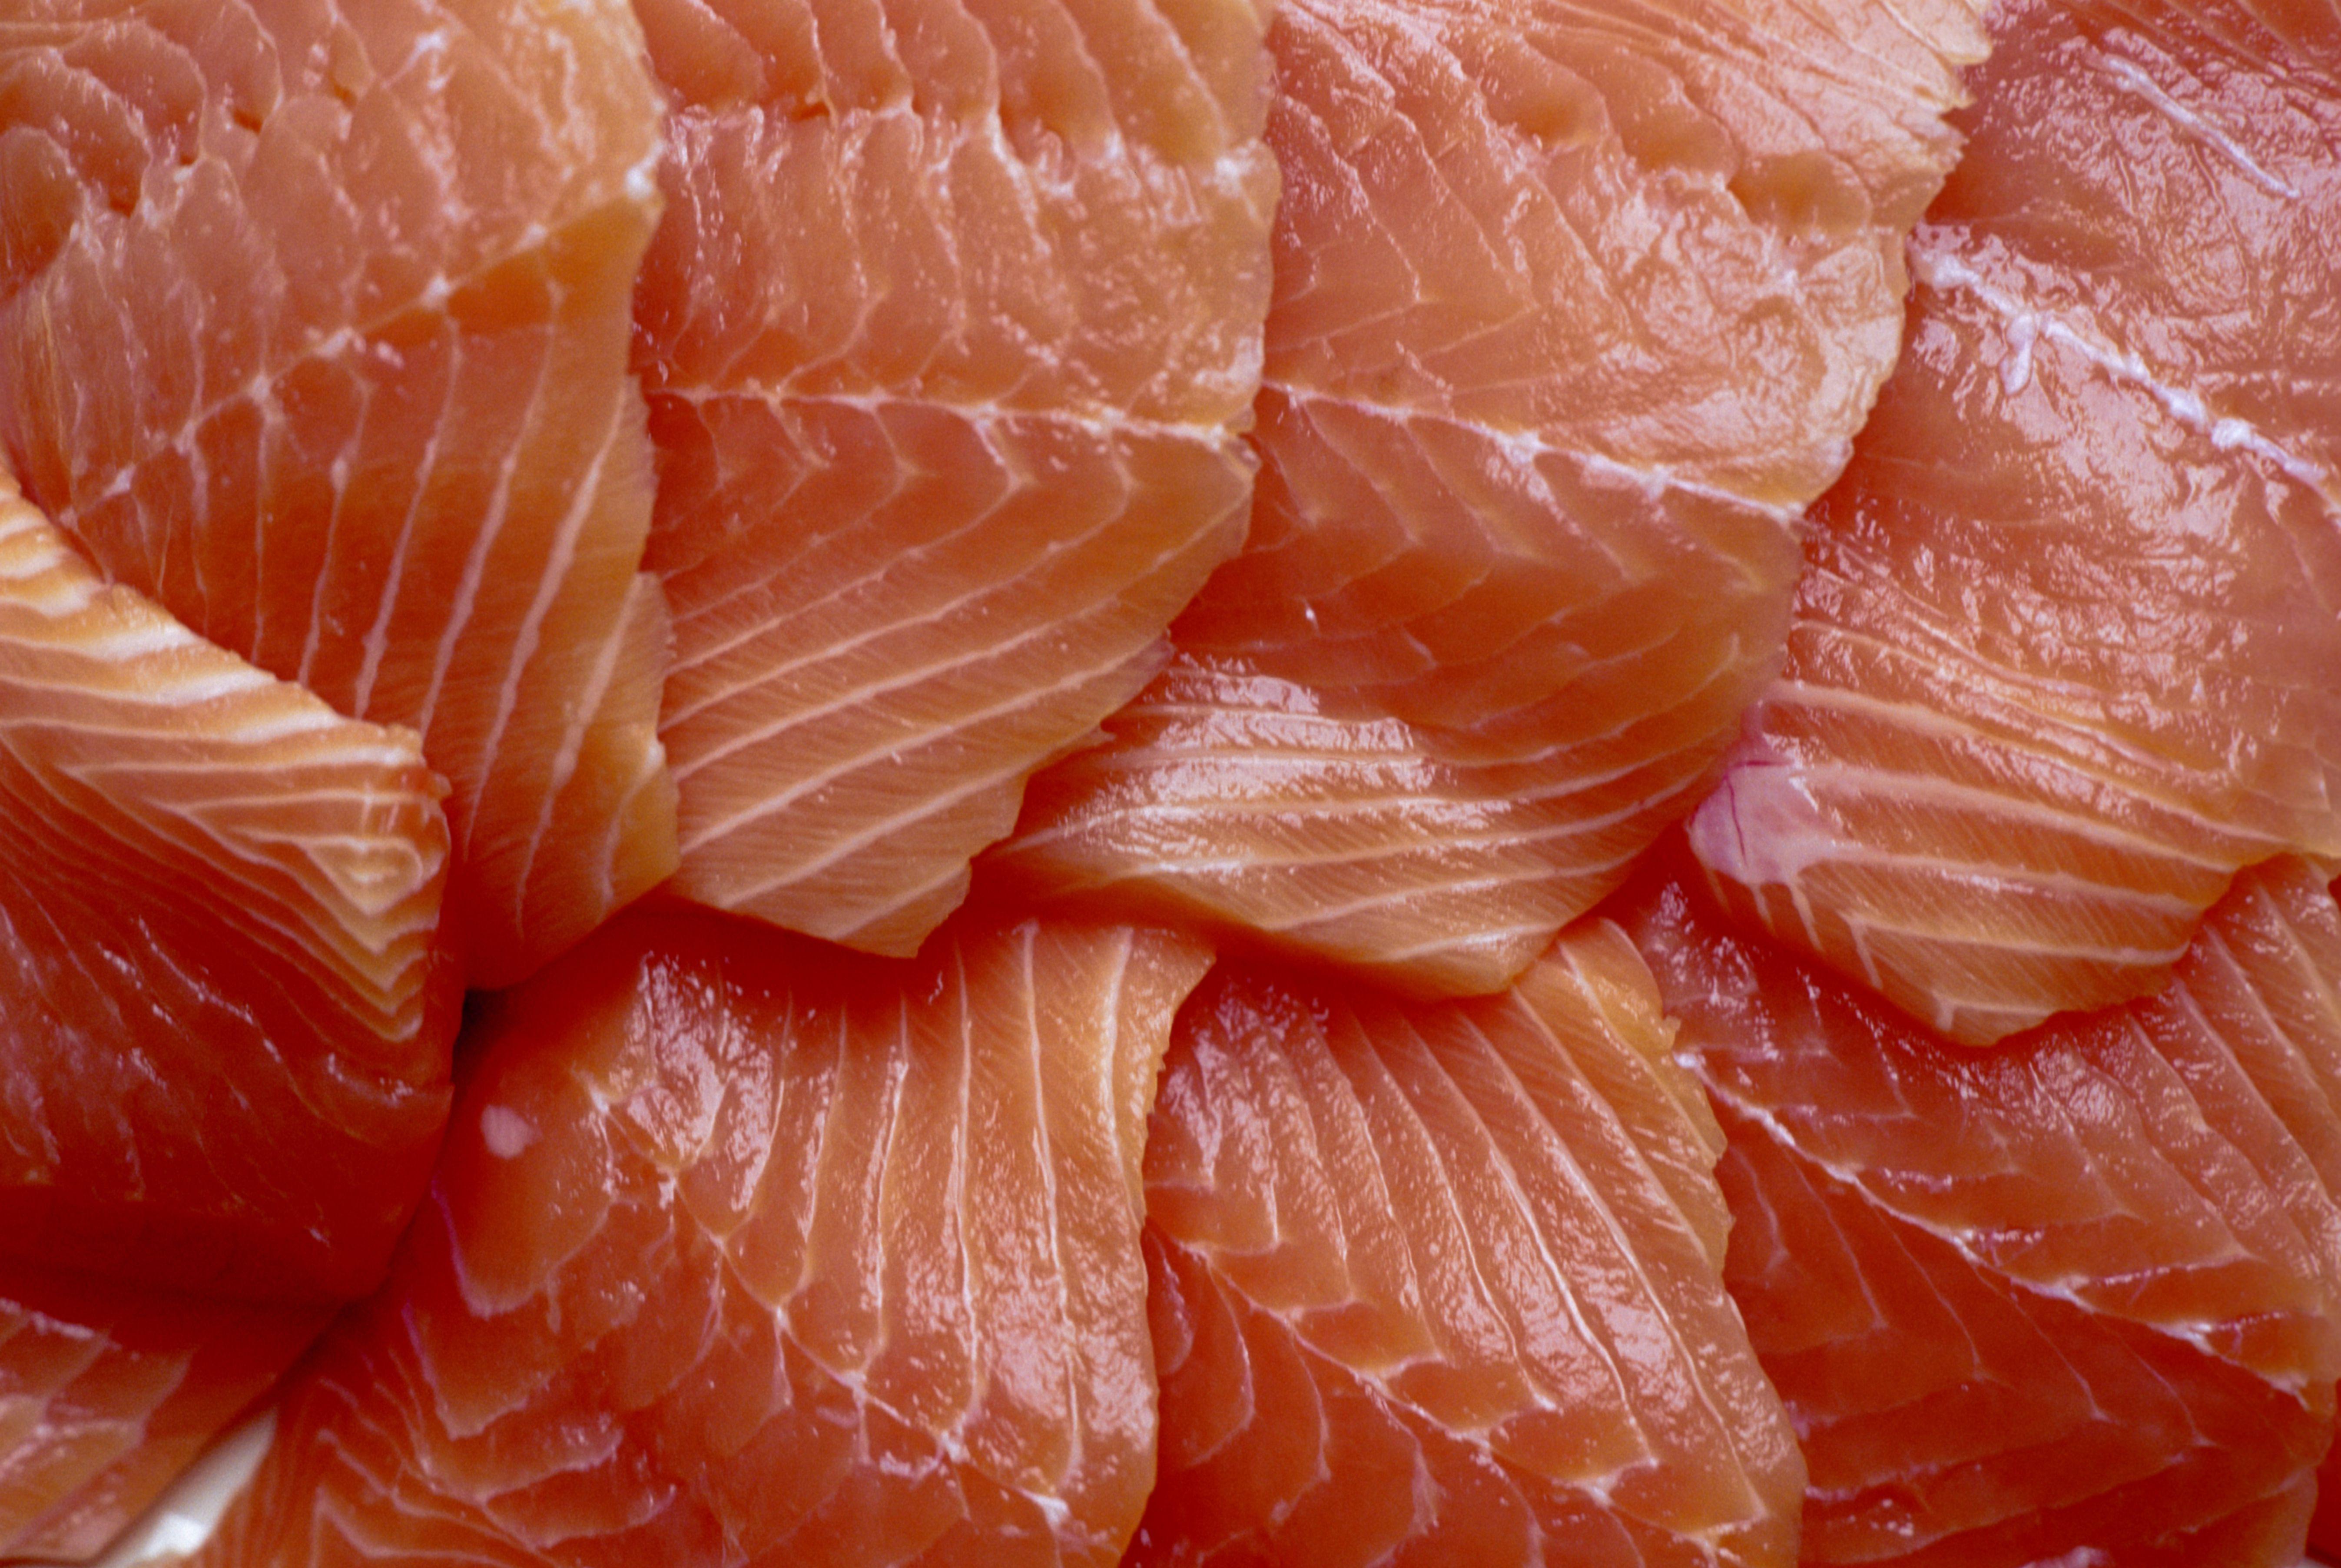 Salmon fillets, close up